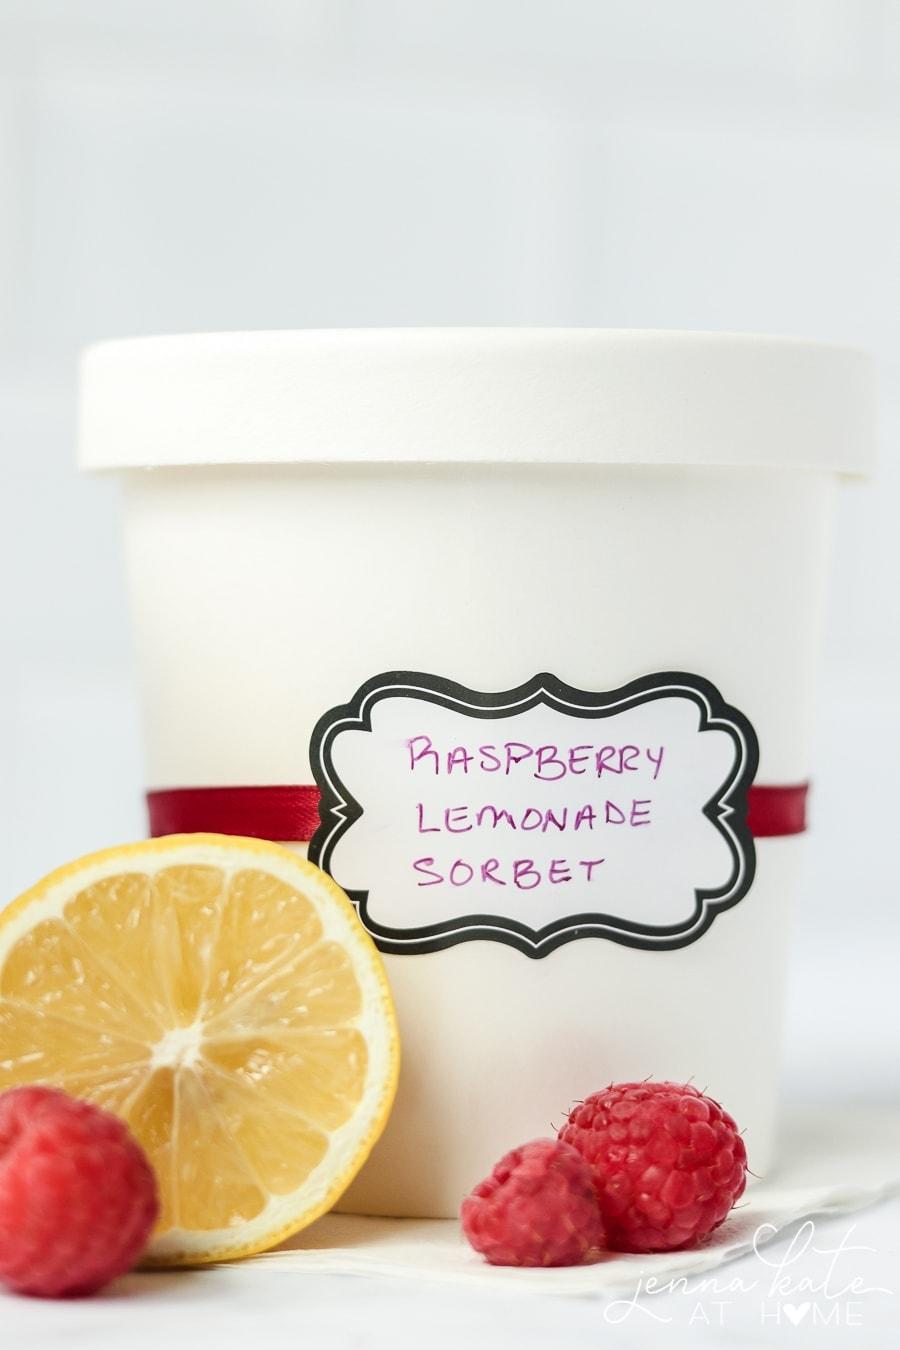 Homemade Raspberry Lemonade Sorbet Recipe